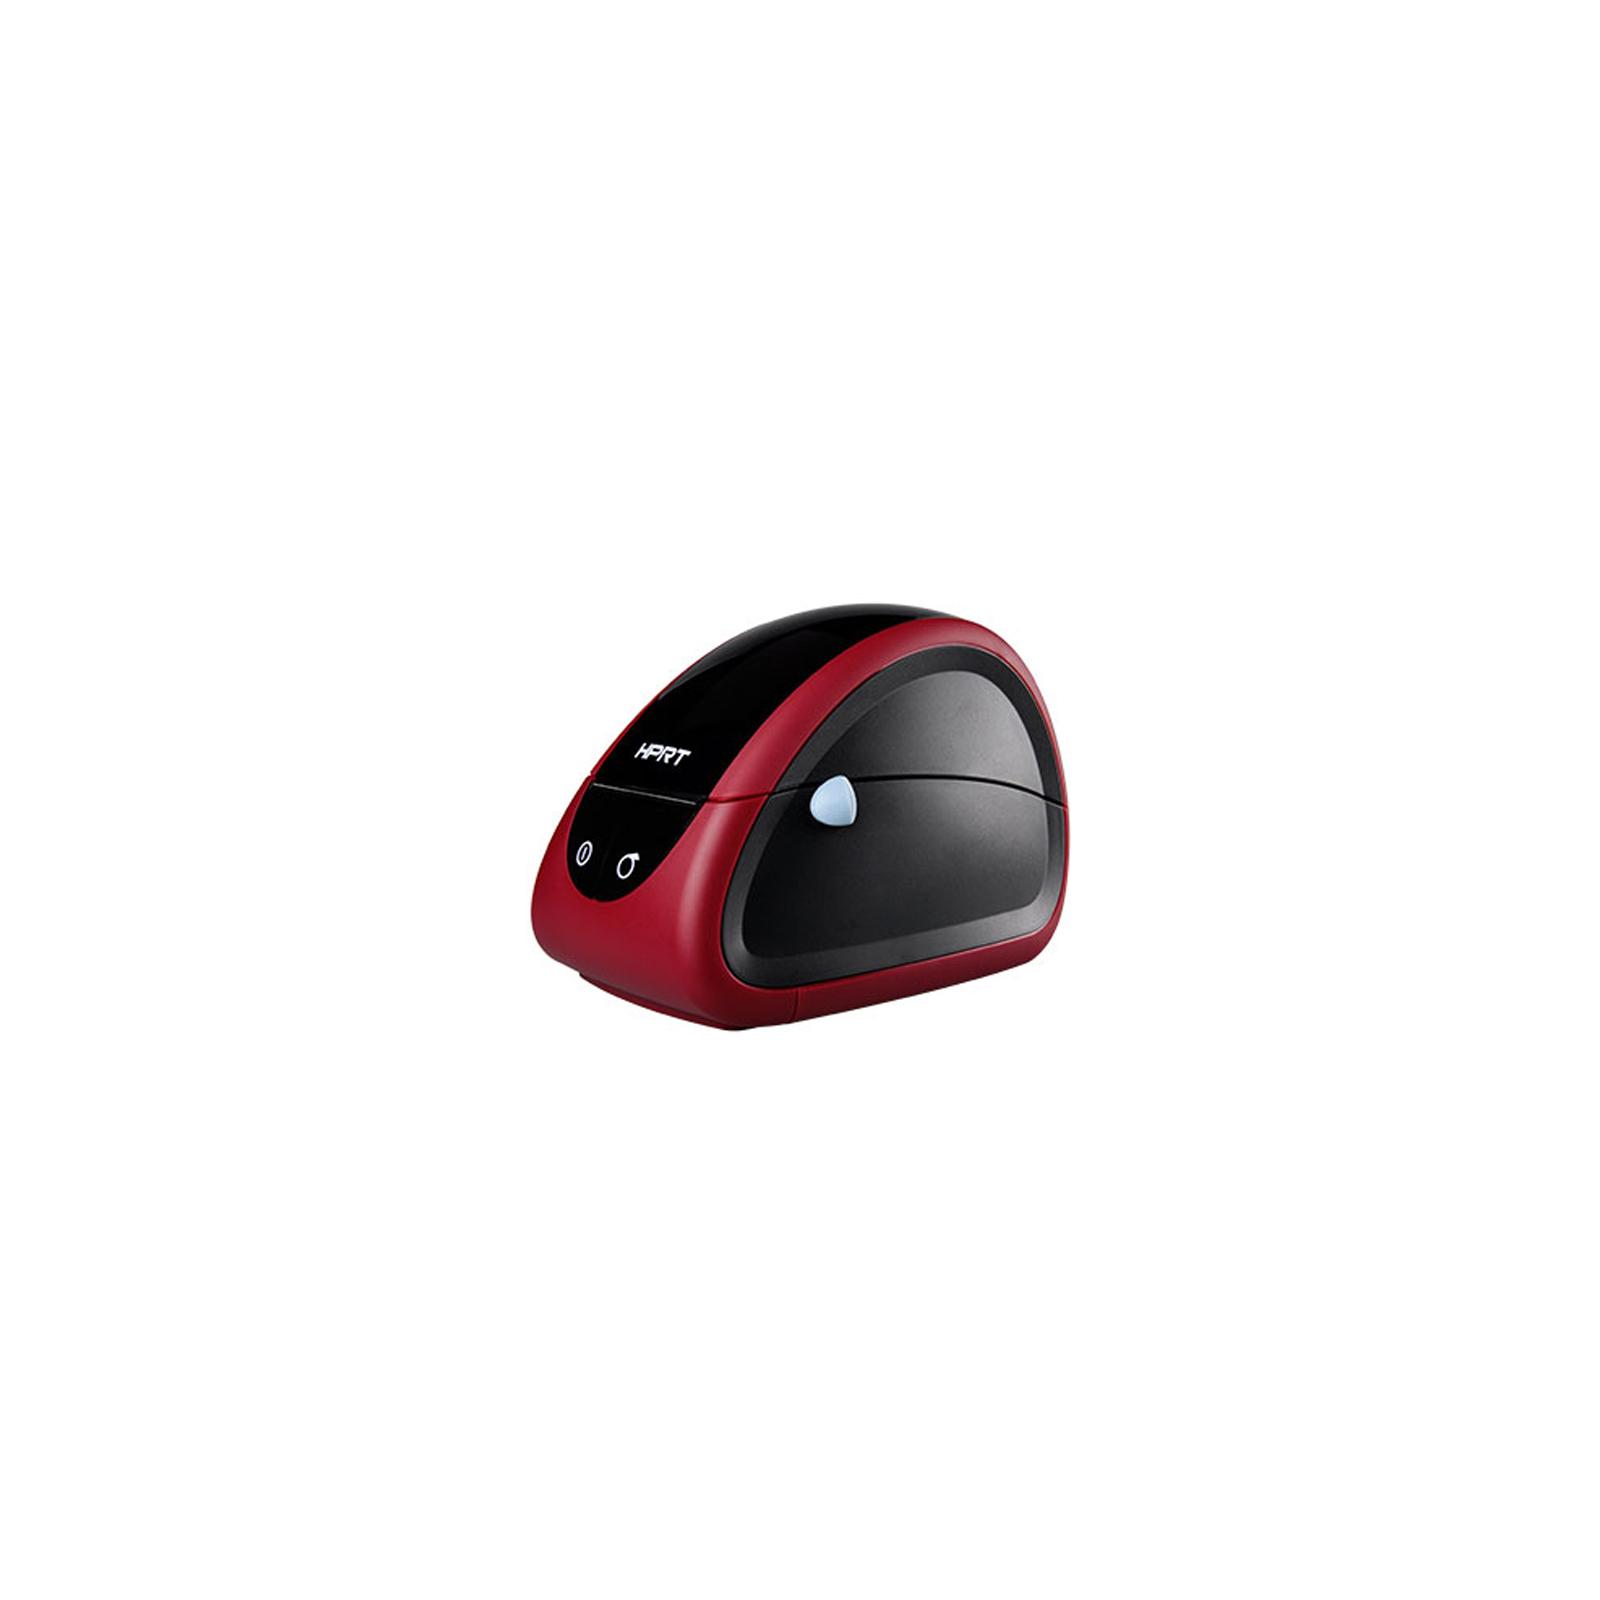 Принтер этикеток HPRT LPQ58 Red_Black (8933)